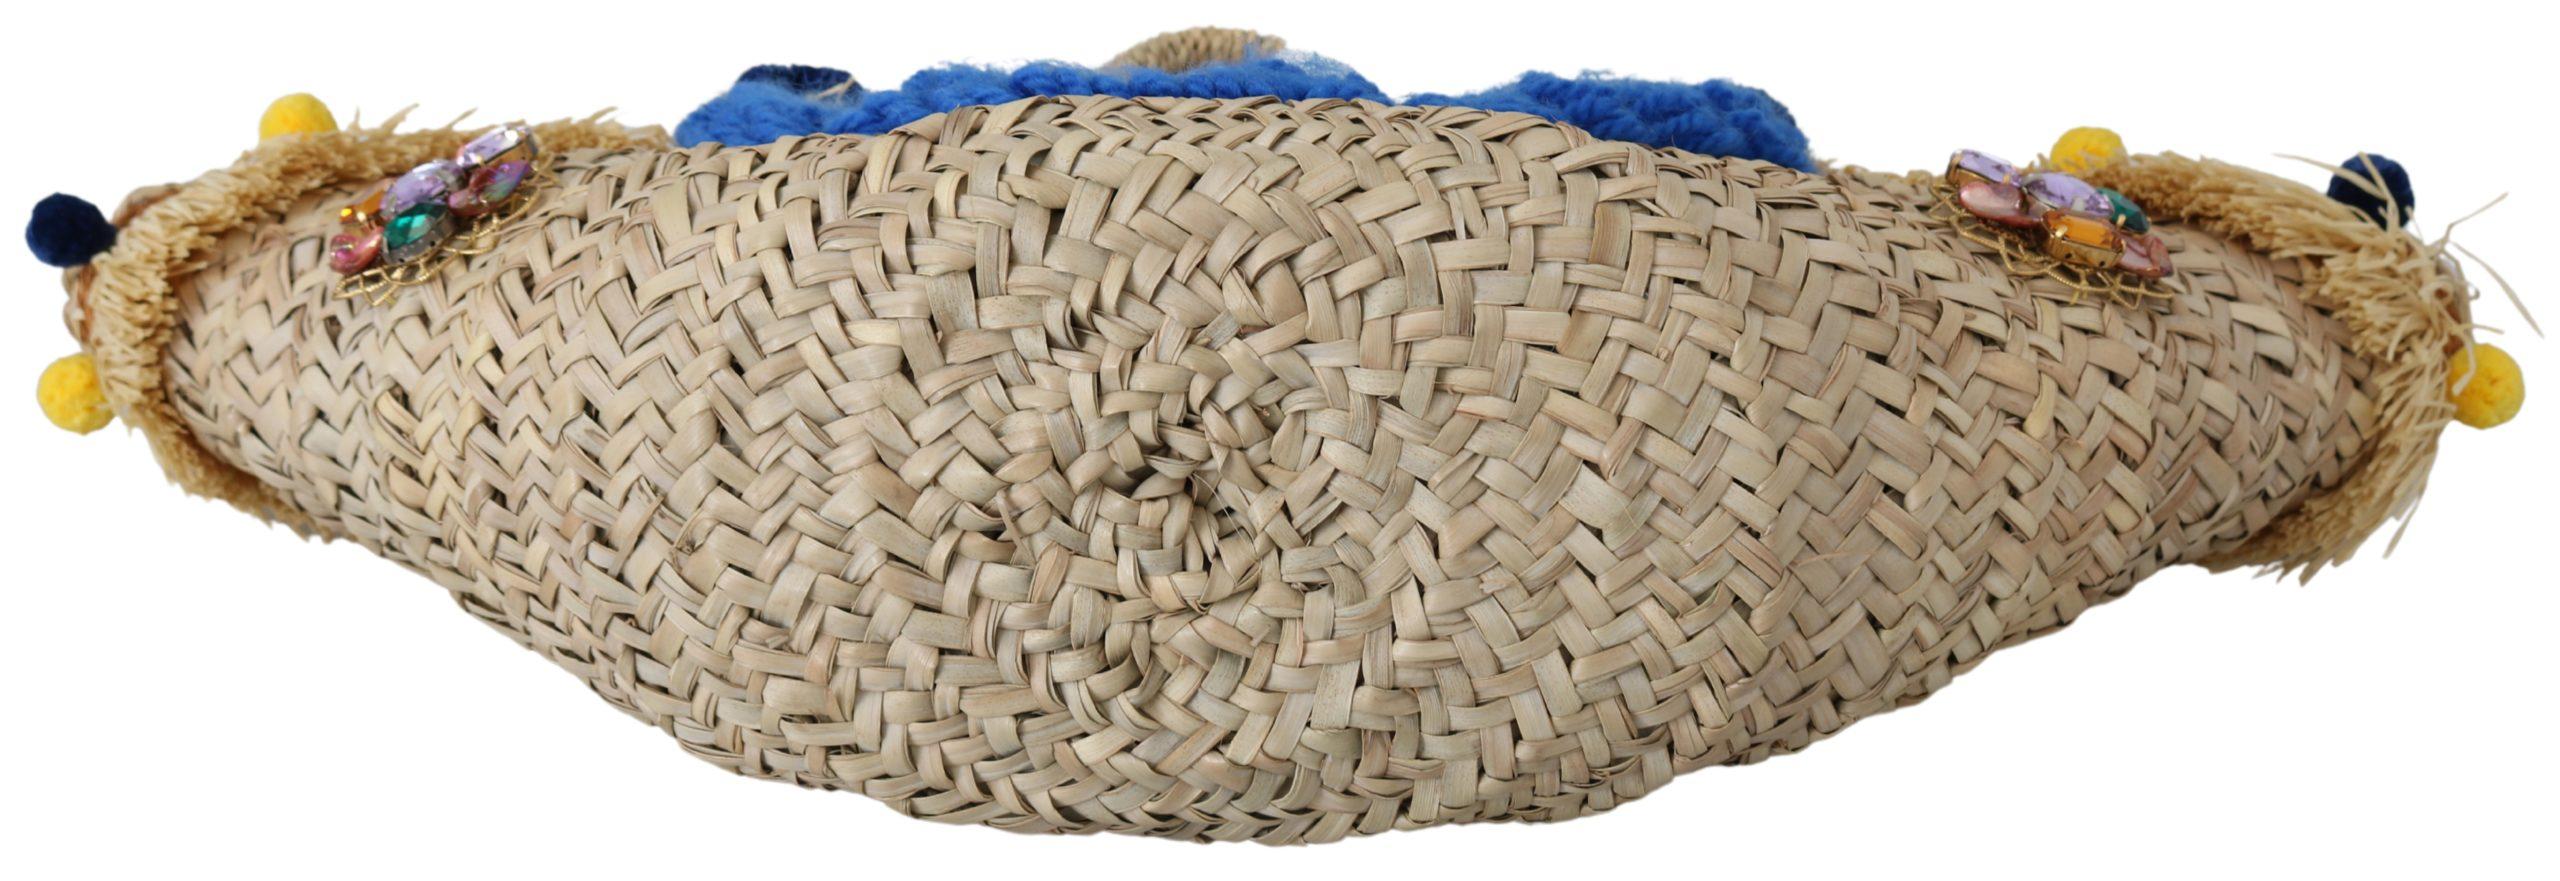 Dolce & Gabbana Women's Straw Fur Balls Crystals Tote Bag Multicolor VAS9628